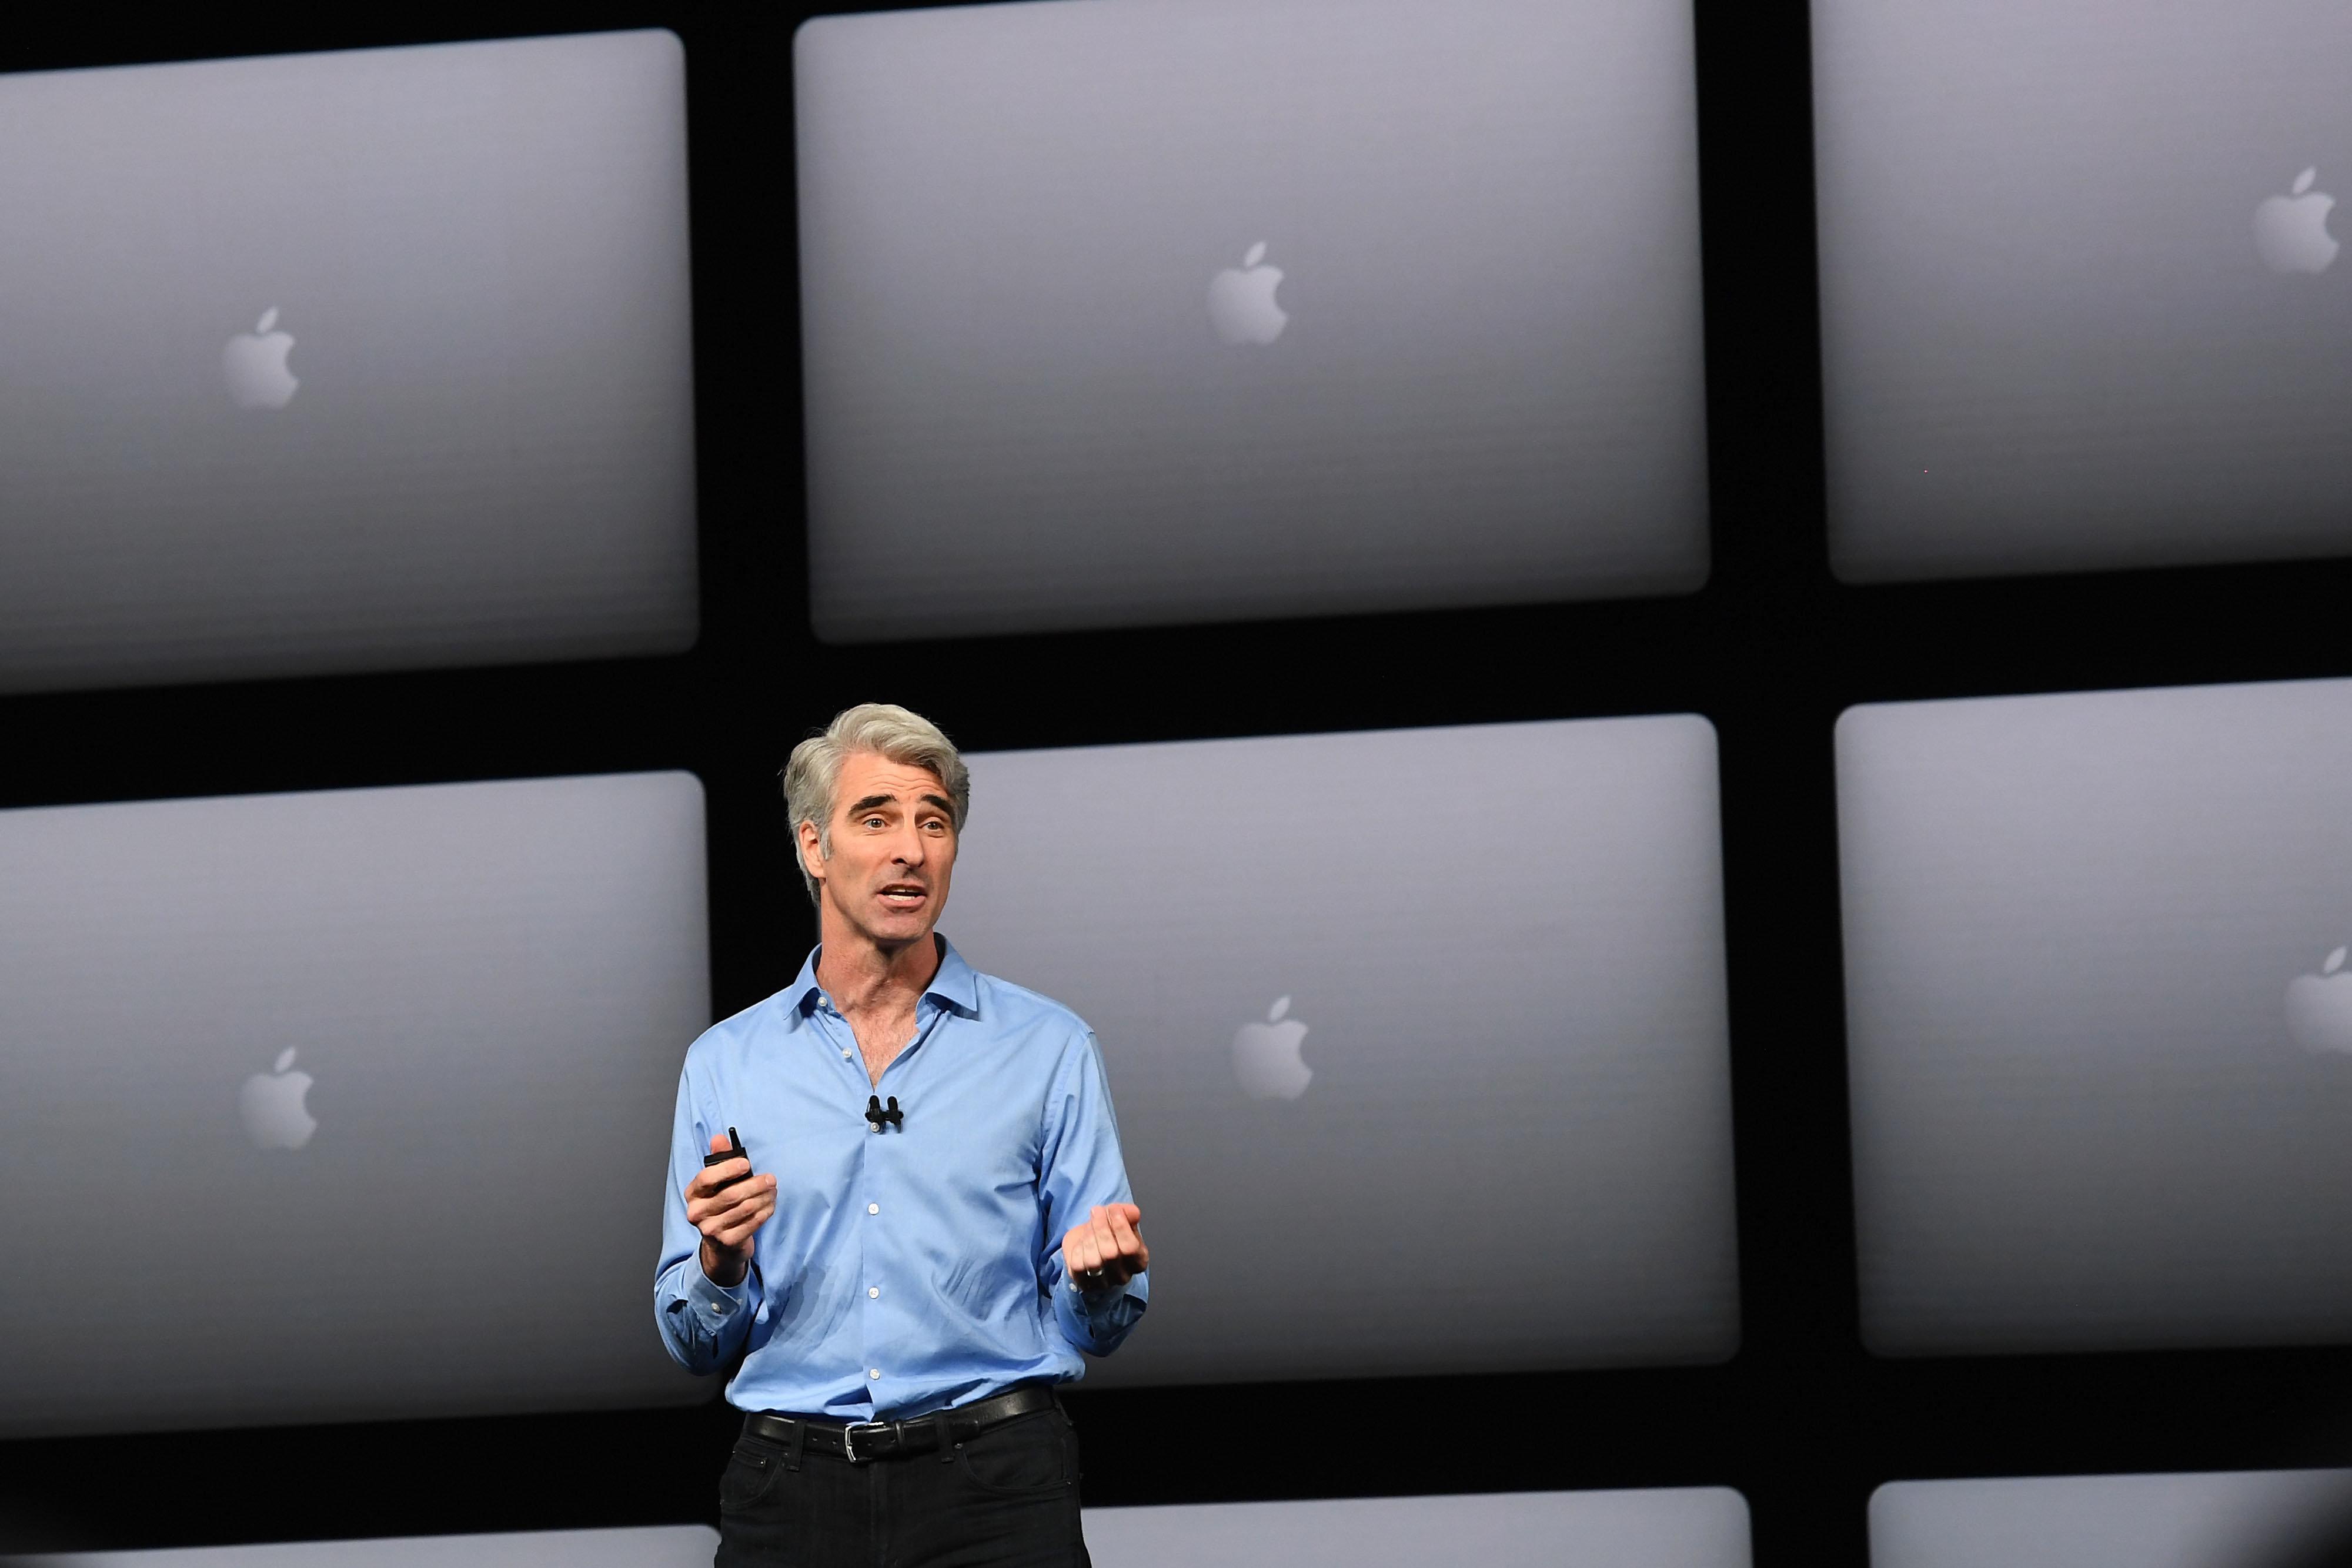 Apple Keynote 2018 im Live Stream gucken: So